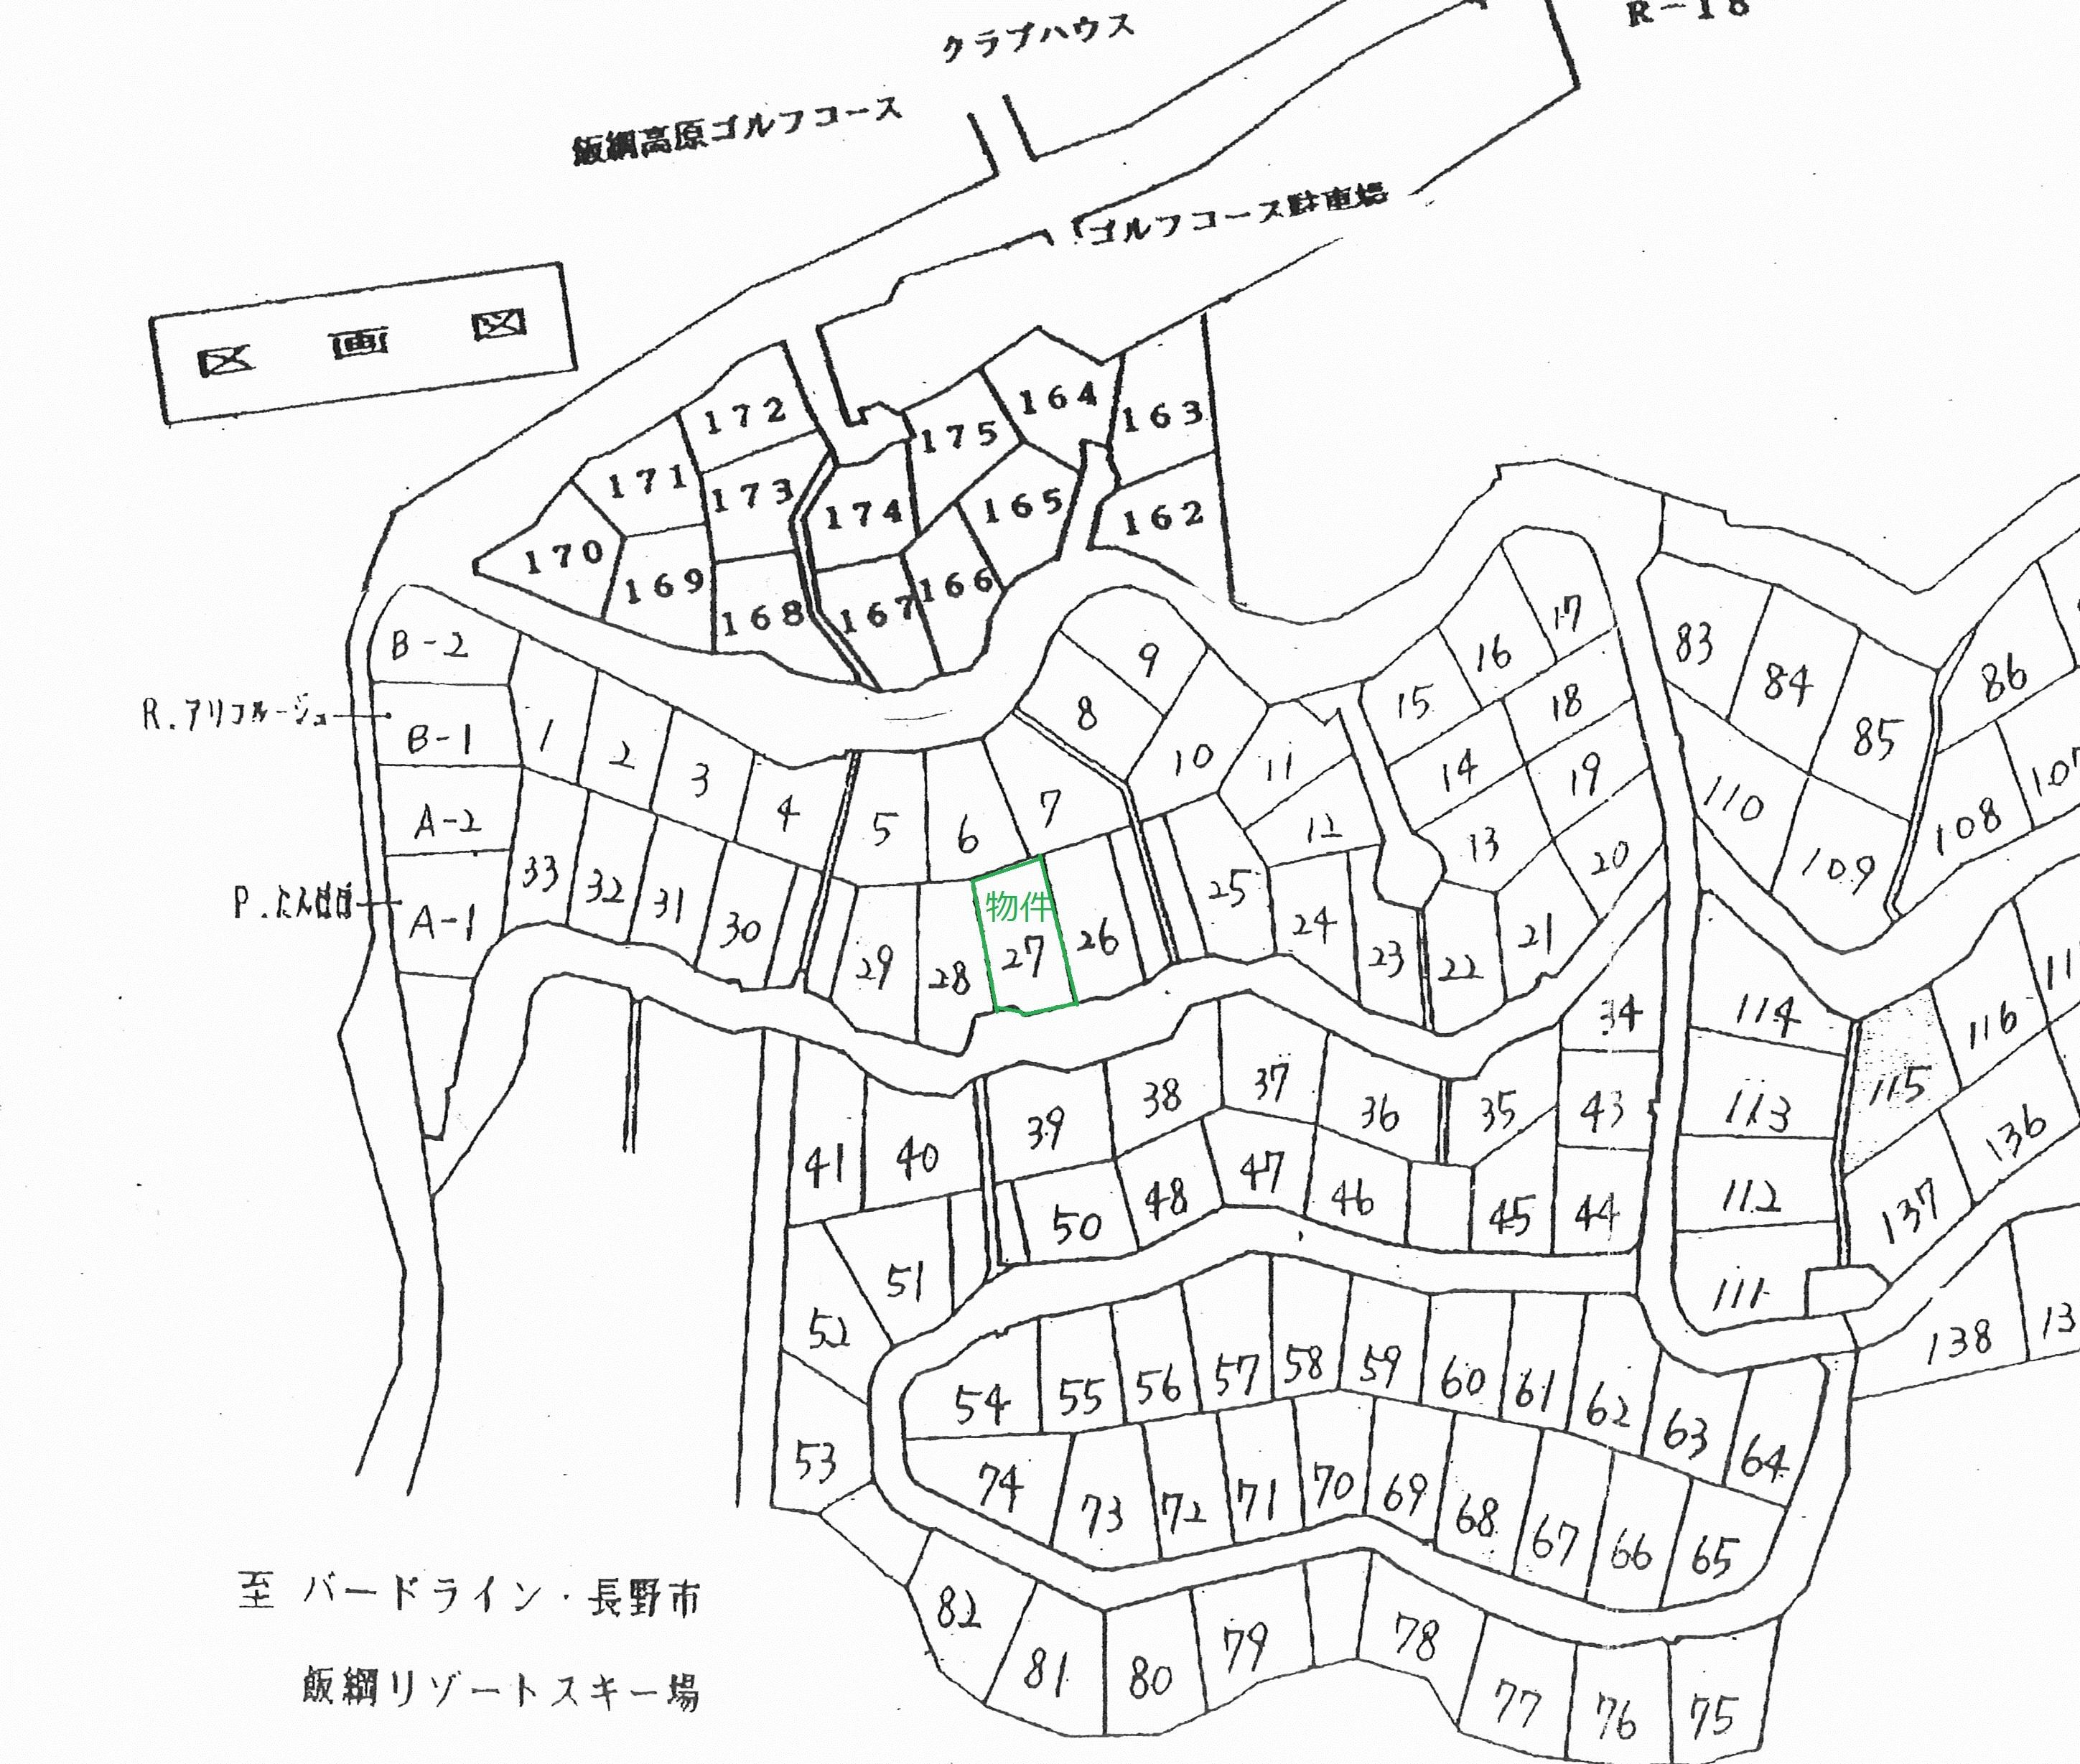 高岡別荘地 売り土地